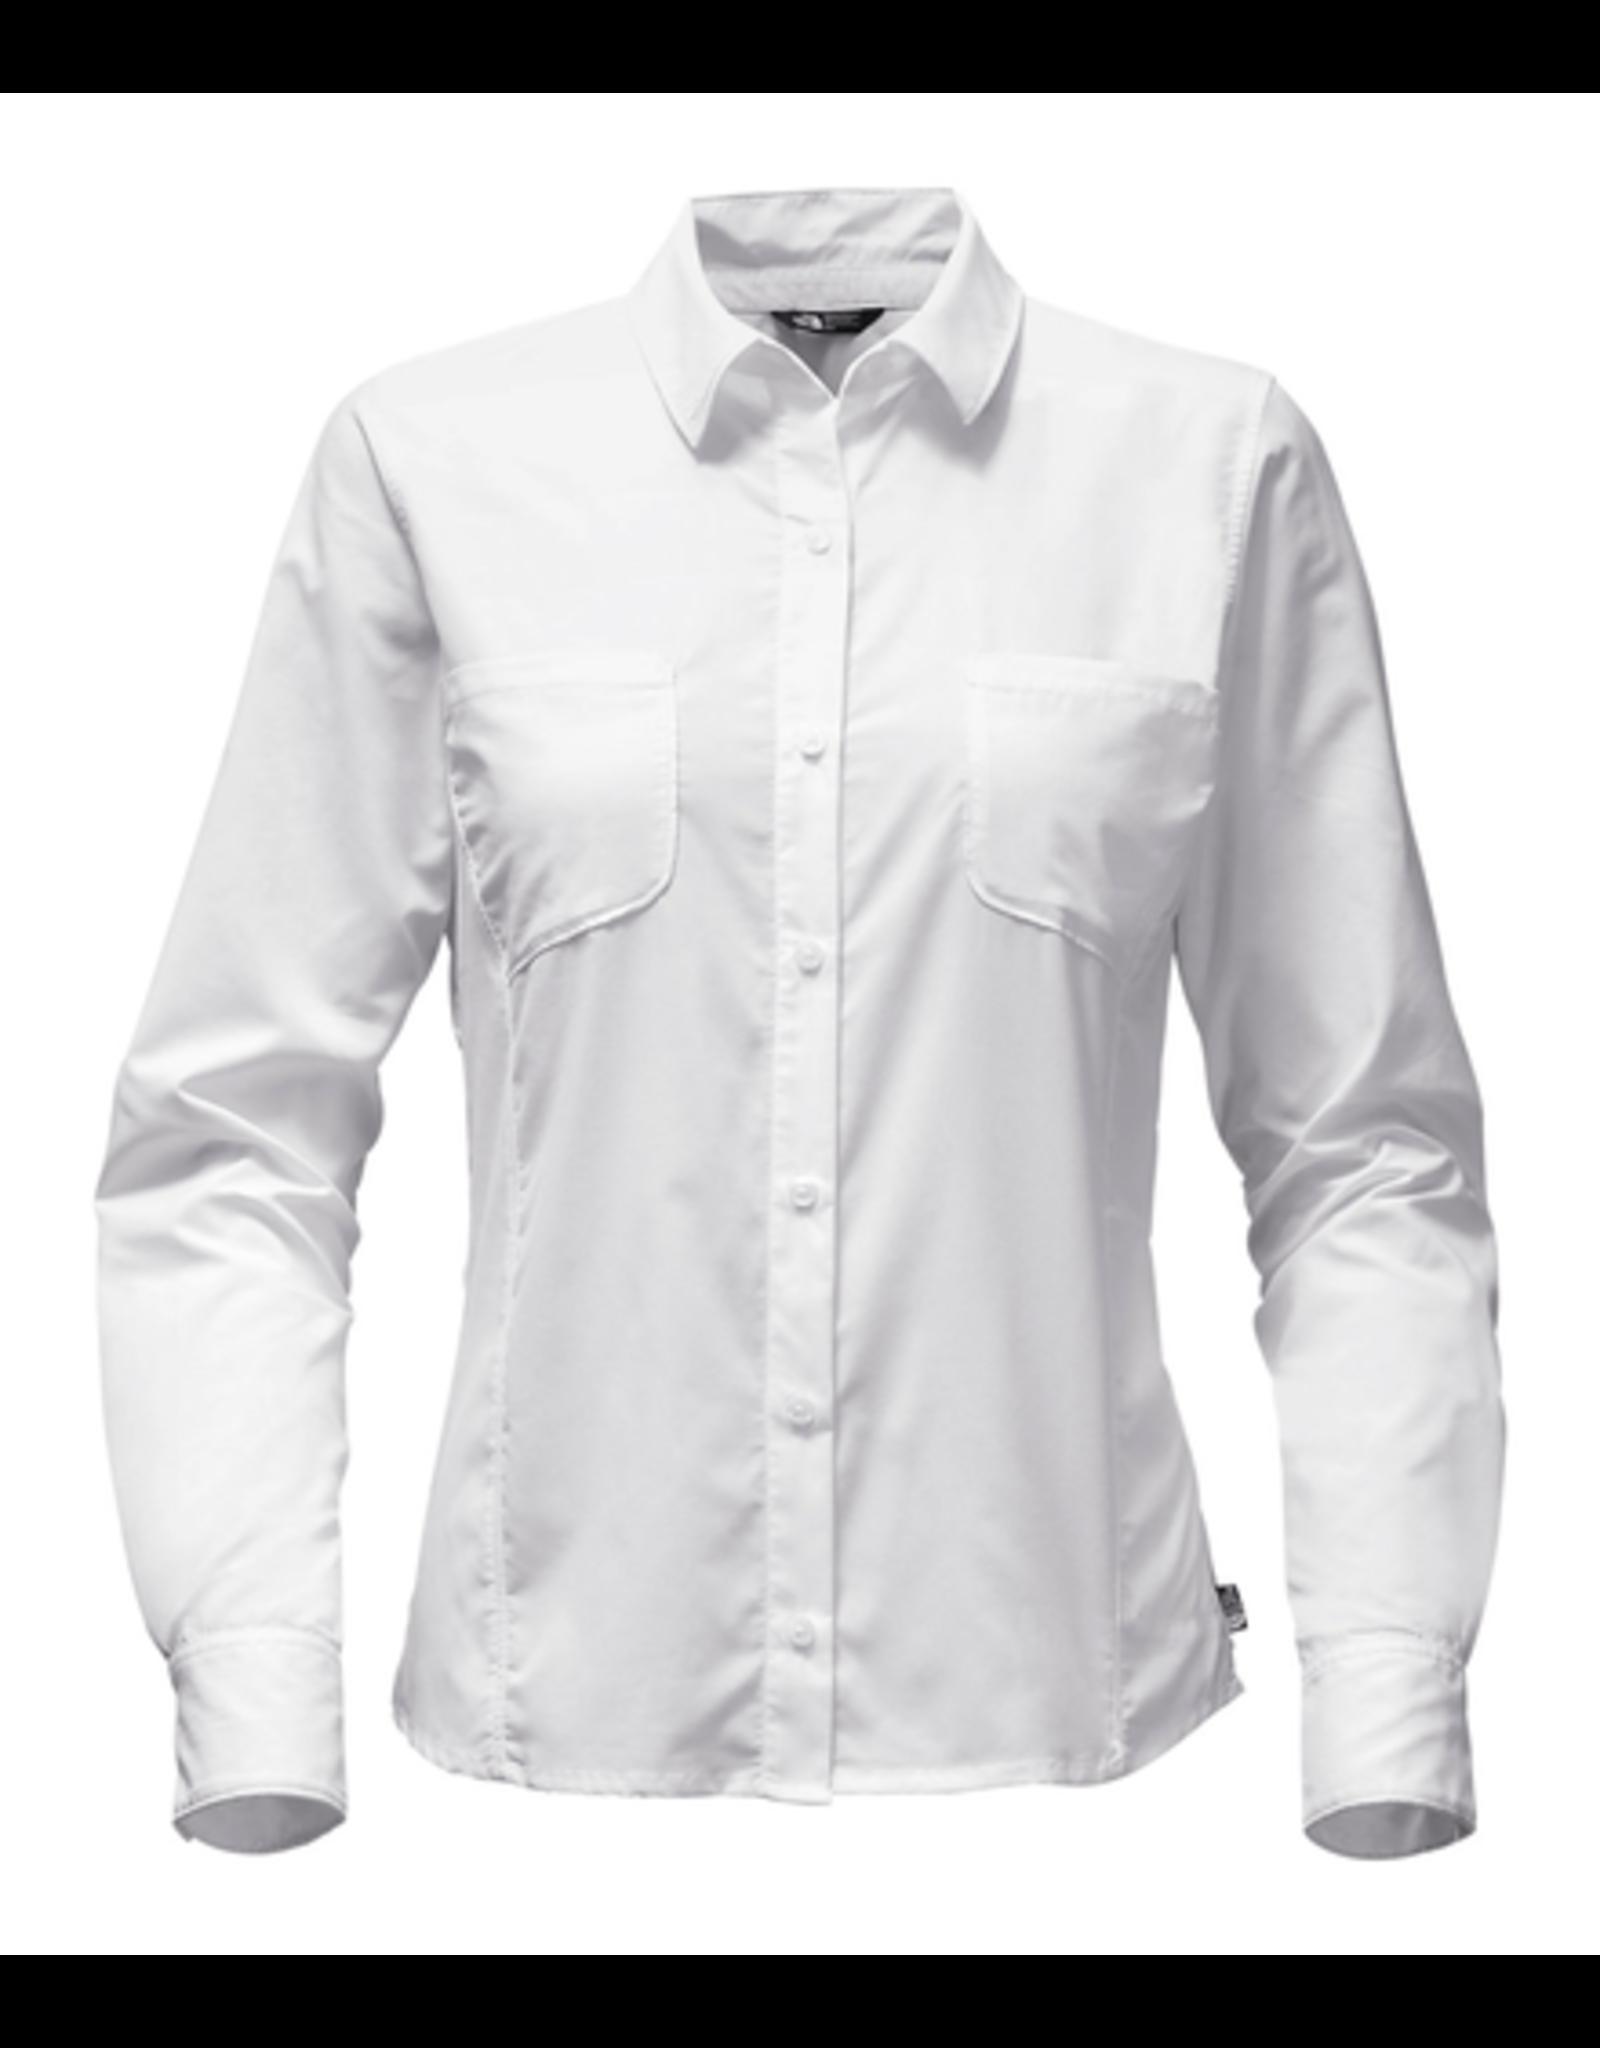 North Face North Face Women's Long-Sleeve Sunblocker Shirt